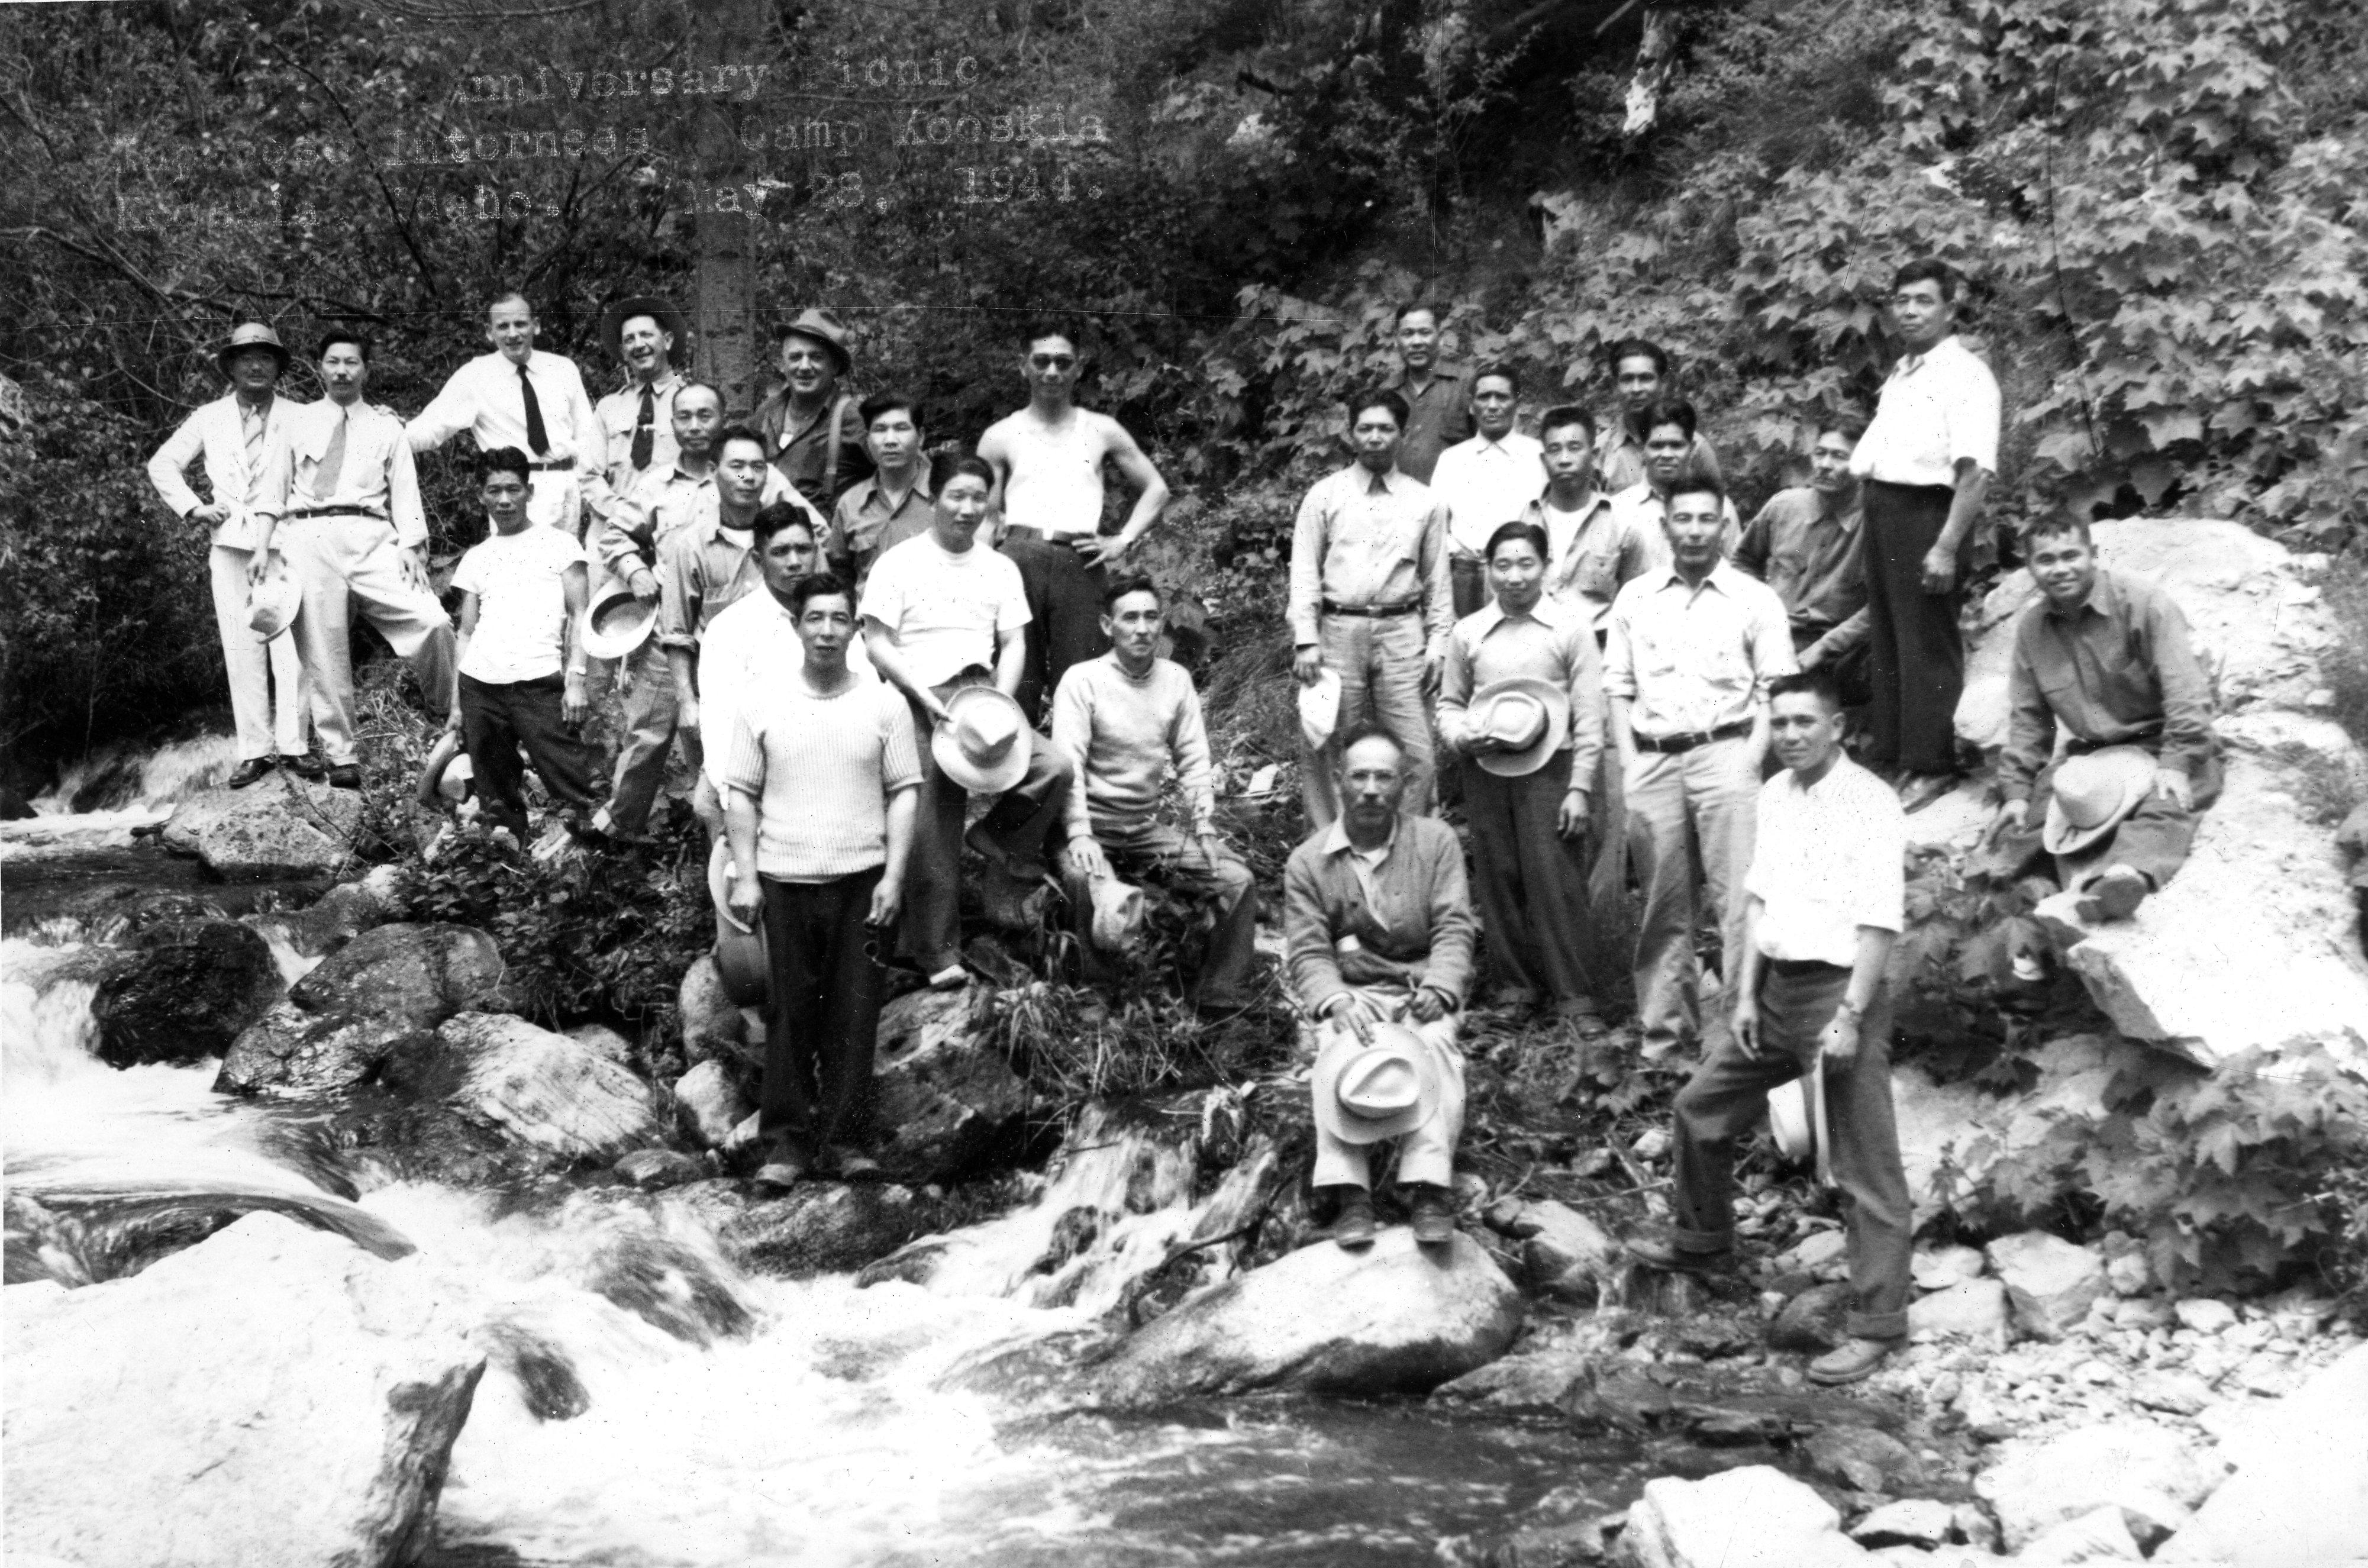 Japanese men at the Kooskia internment camp in northern Idaho during World War II.